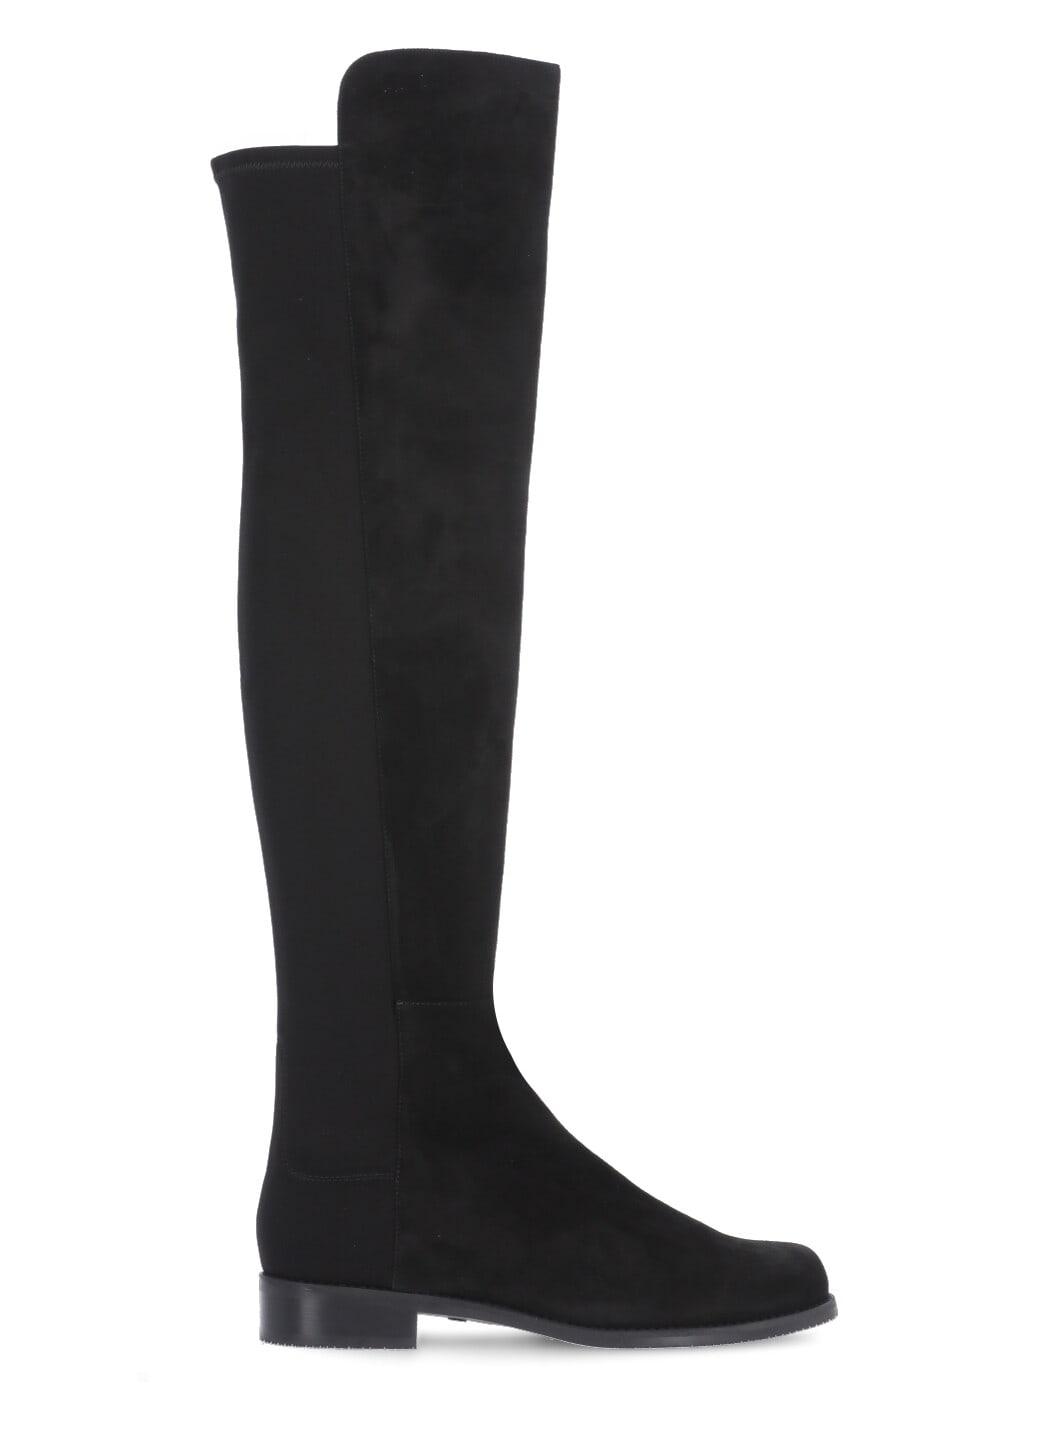 Buy Stuart Weitzman 5050 Boot online, shop Stuart Weitzman shoes with free shipping